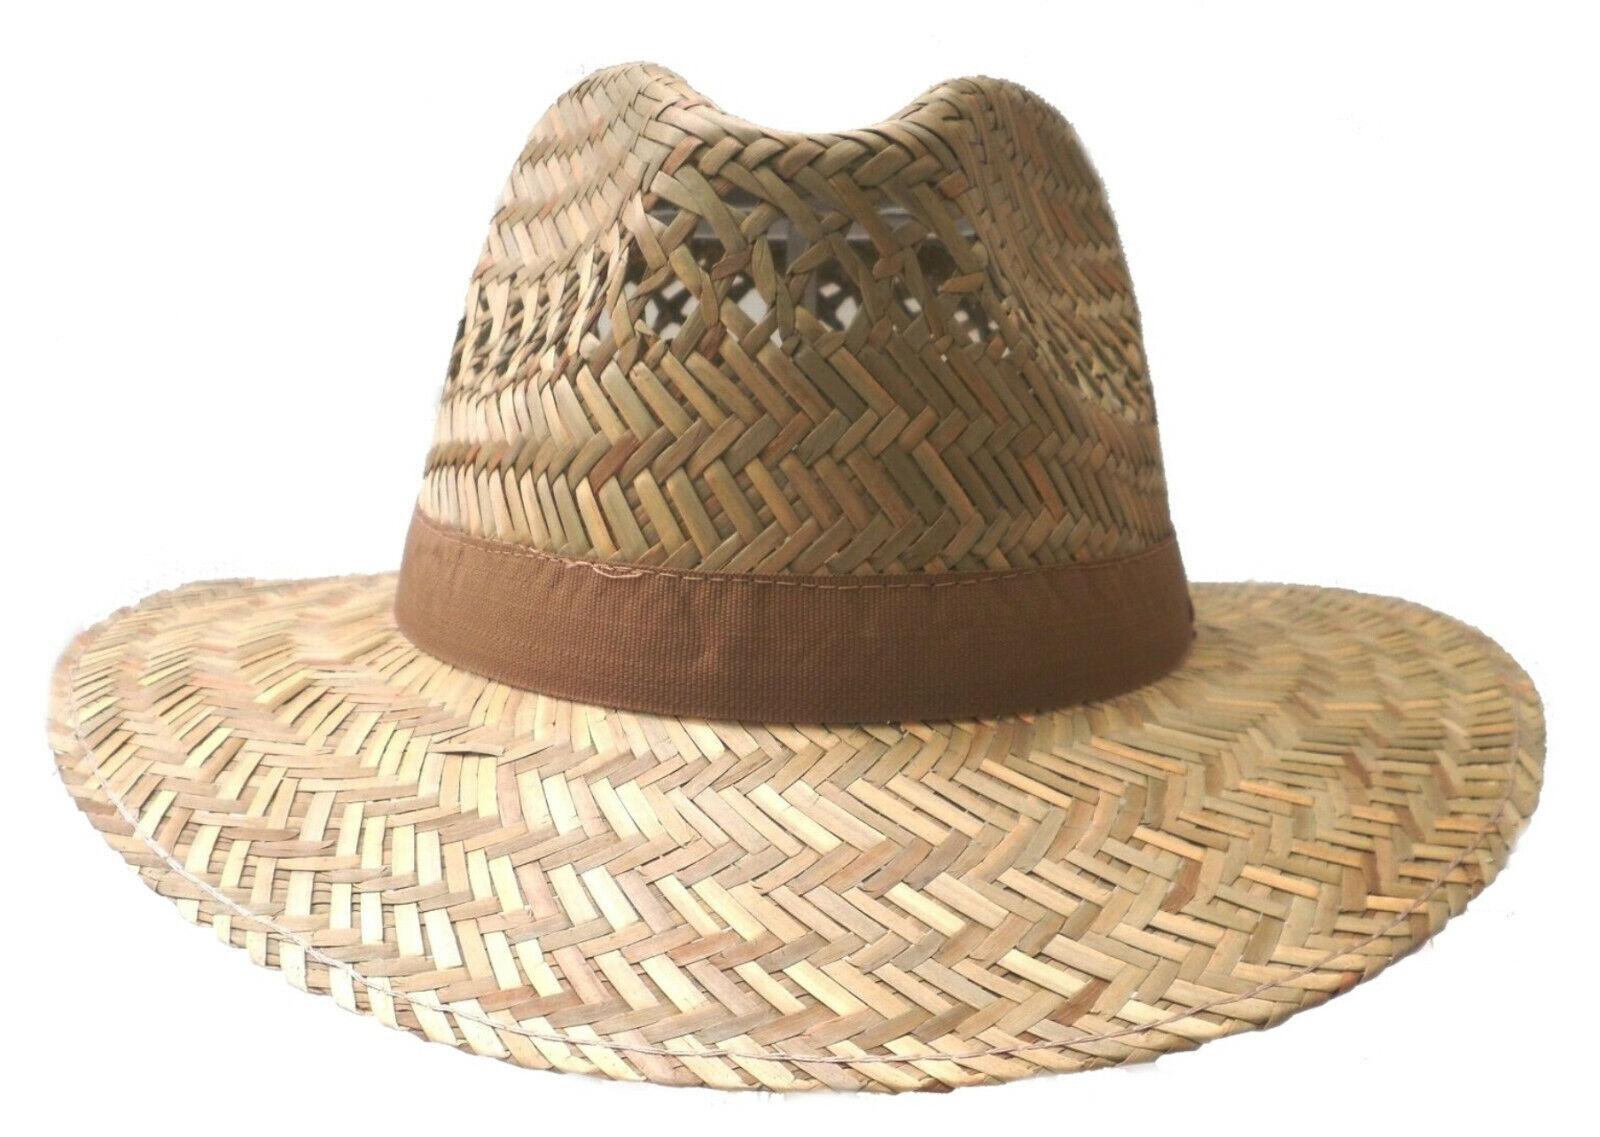 6ee84d14d9b1d Men's Hat Natural Straw to XXL Straight Brim Traveller Vacation Garden  Hiking